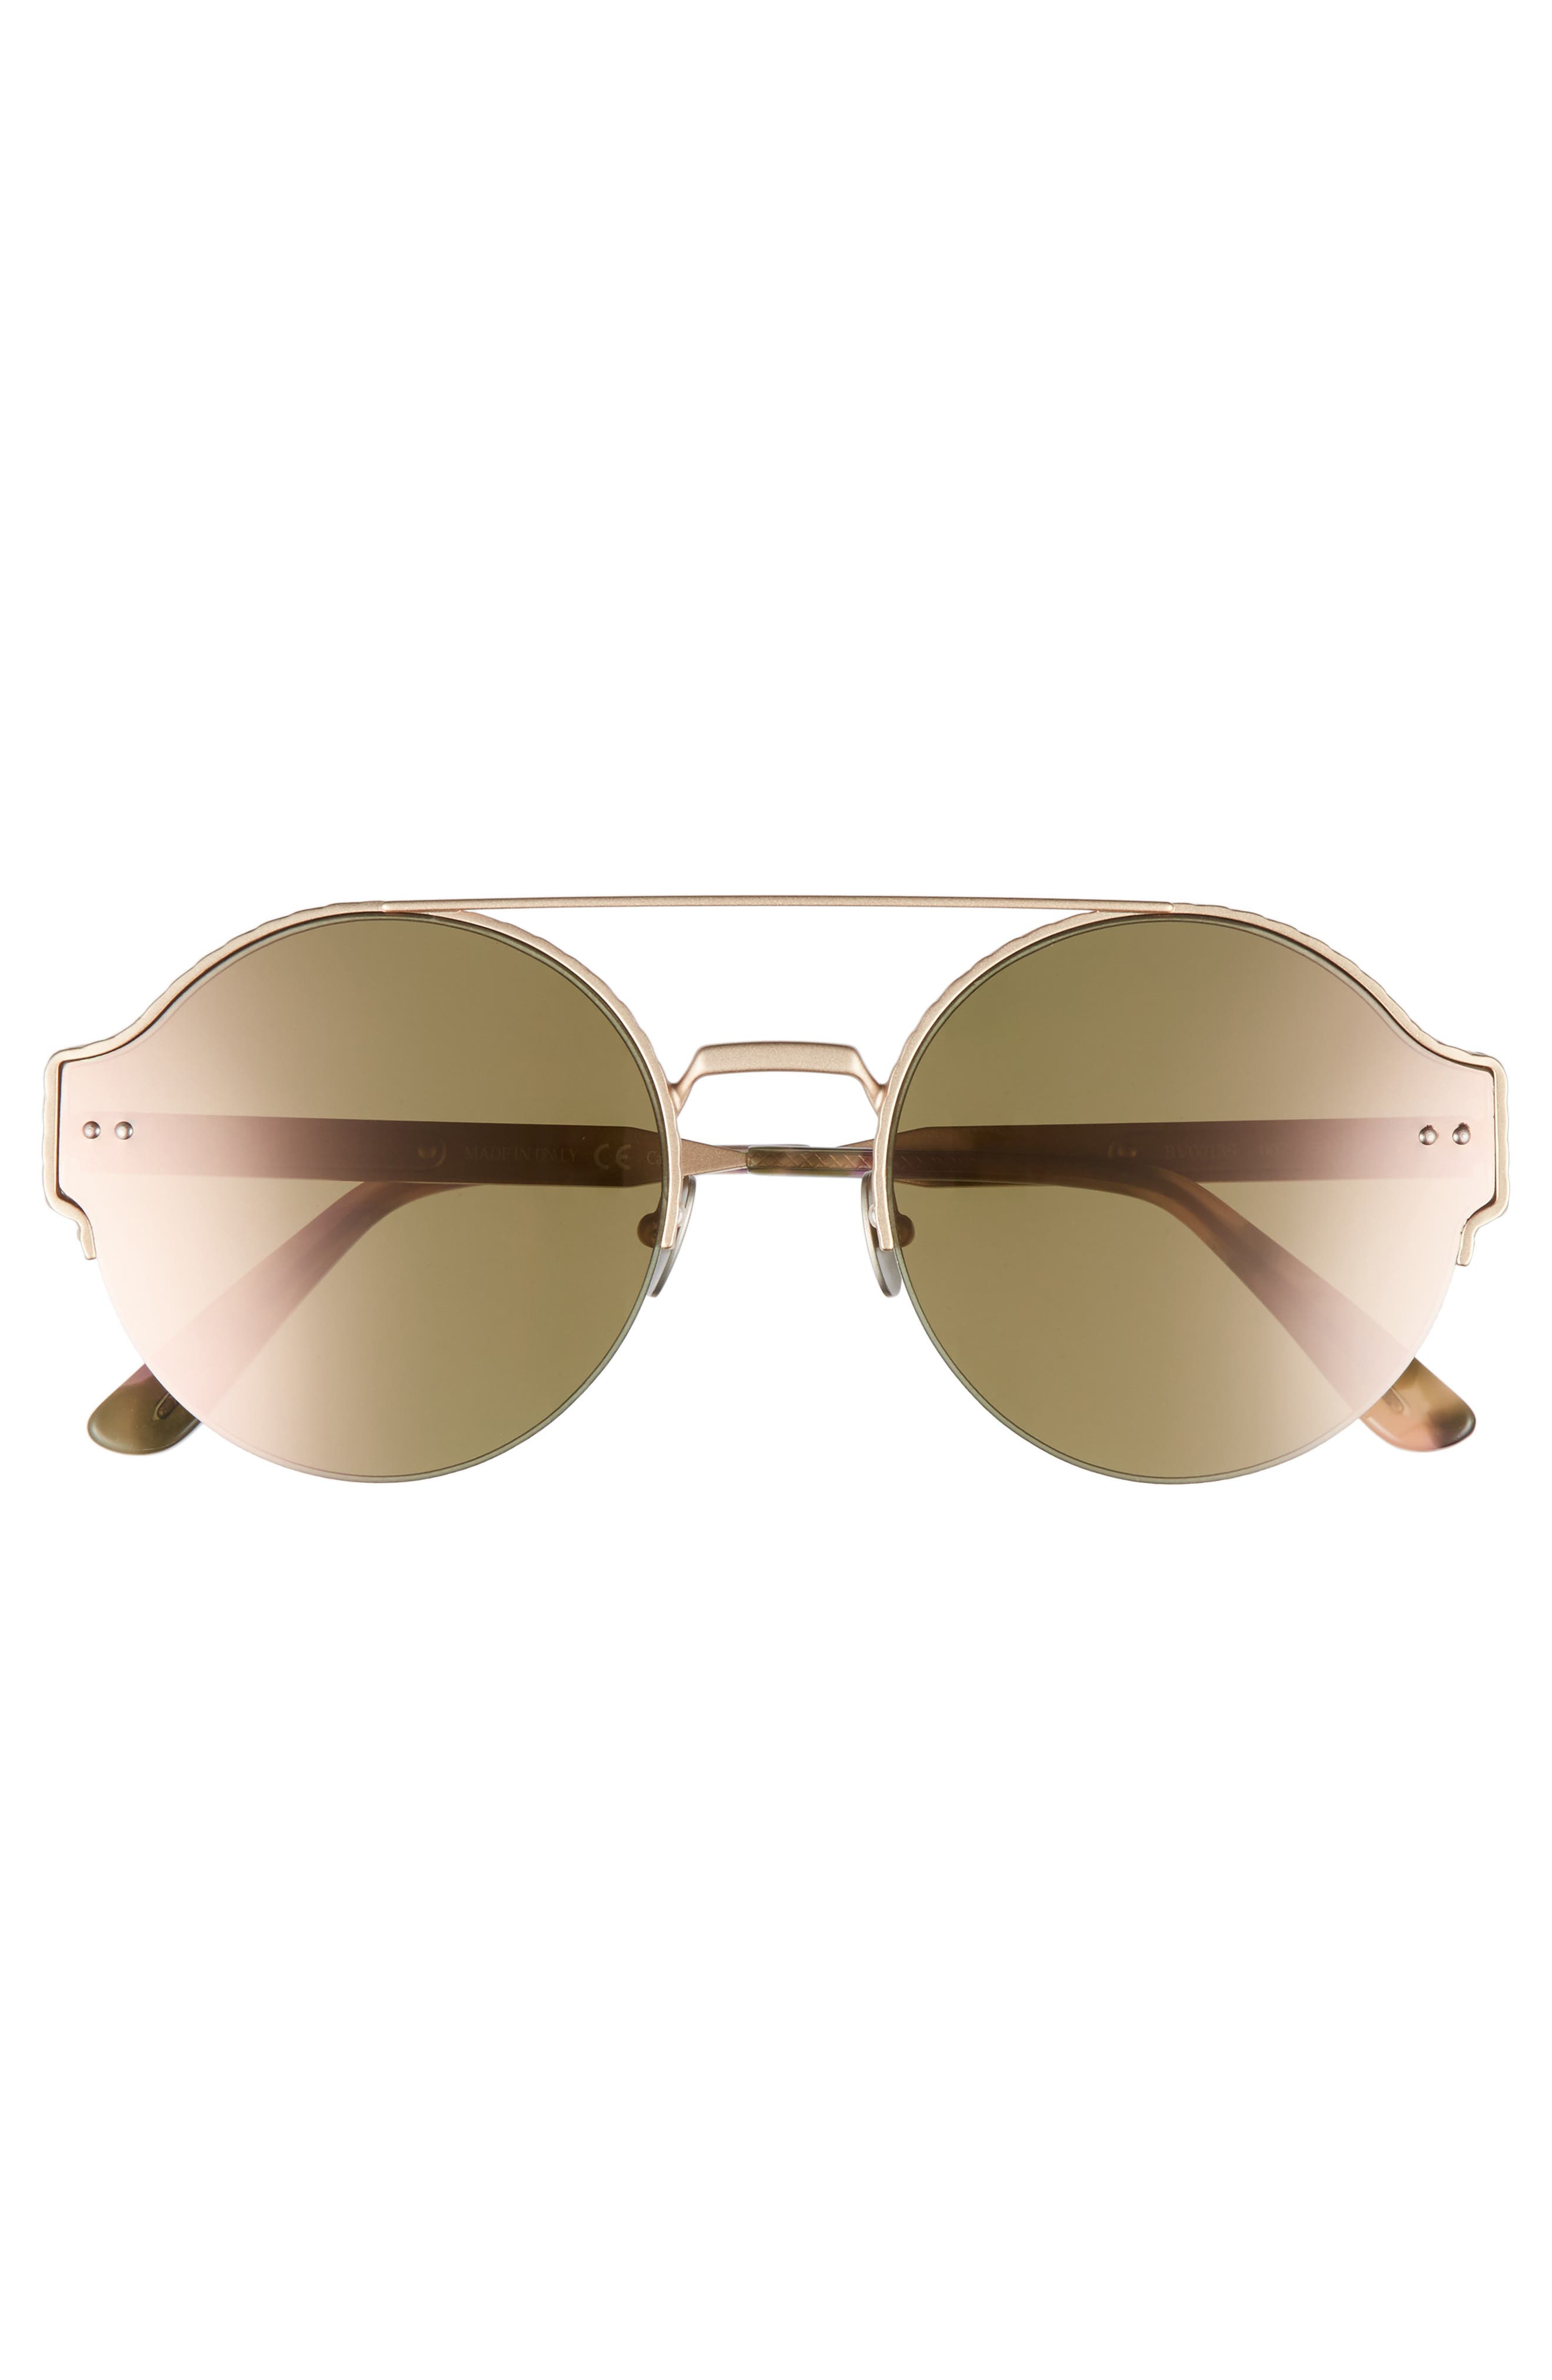 54mm Round Semi-Rimless Sunglasses,                             Alternate thumbnail 9, color,